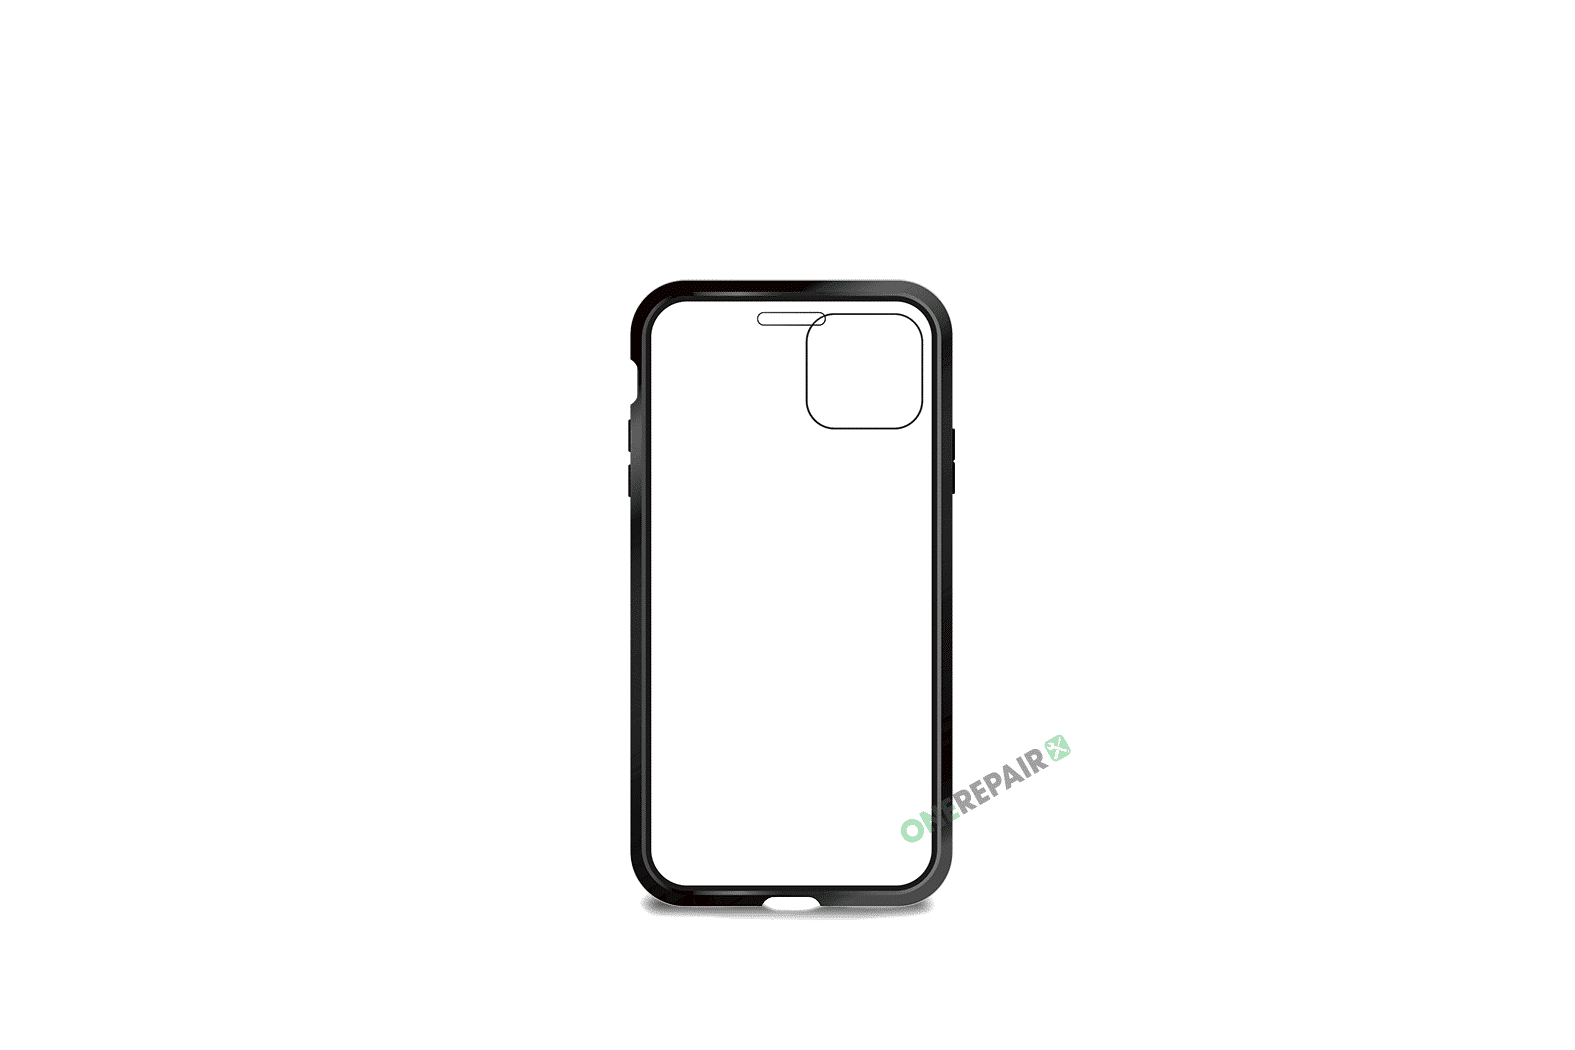 353789-001_iPhone_11_Pro_Magnetisk_Case_Sort_OneRepair_00001